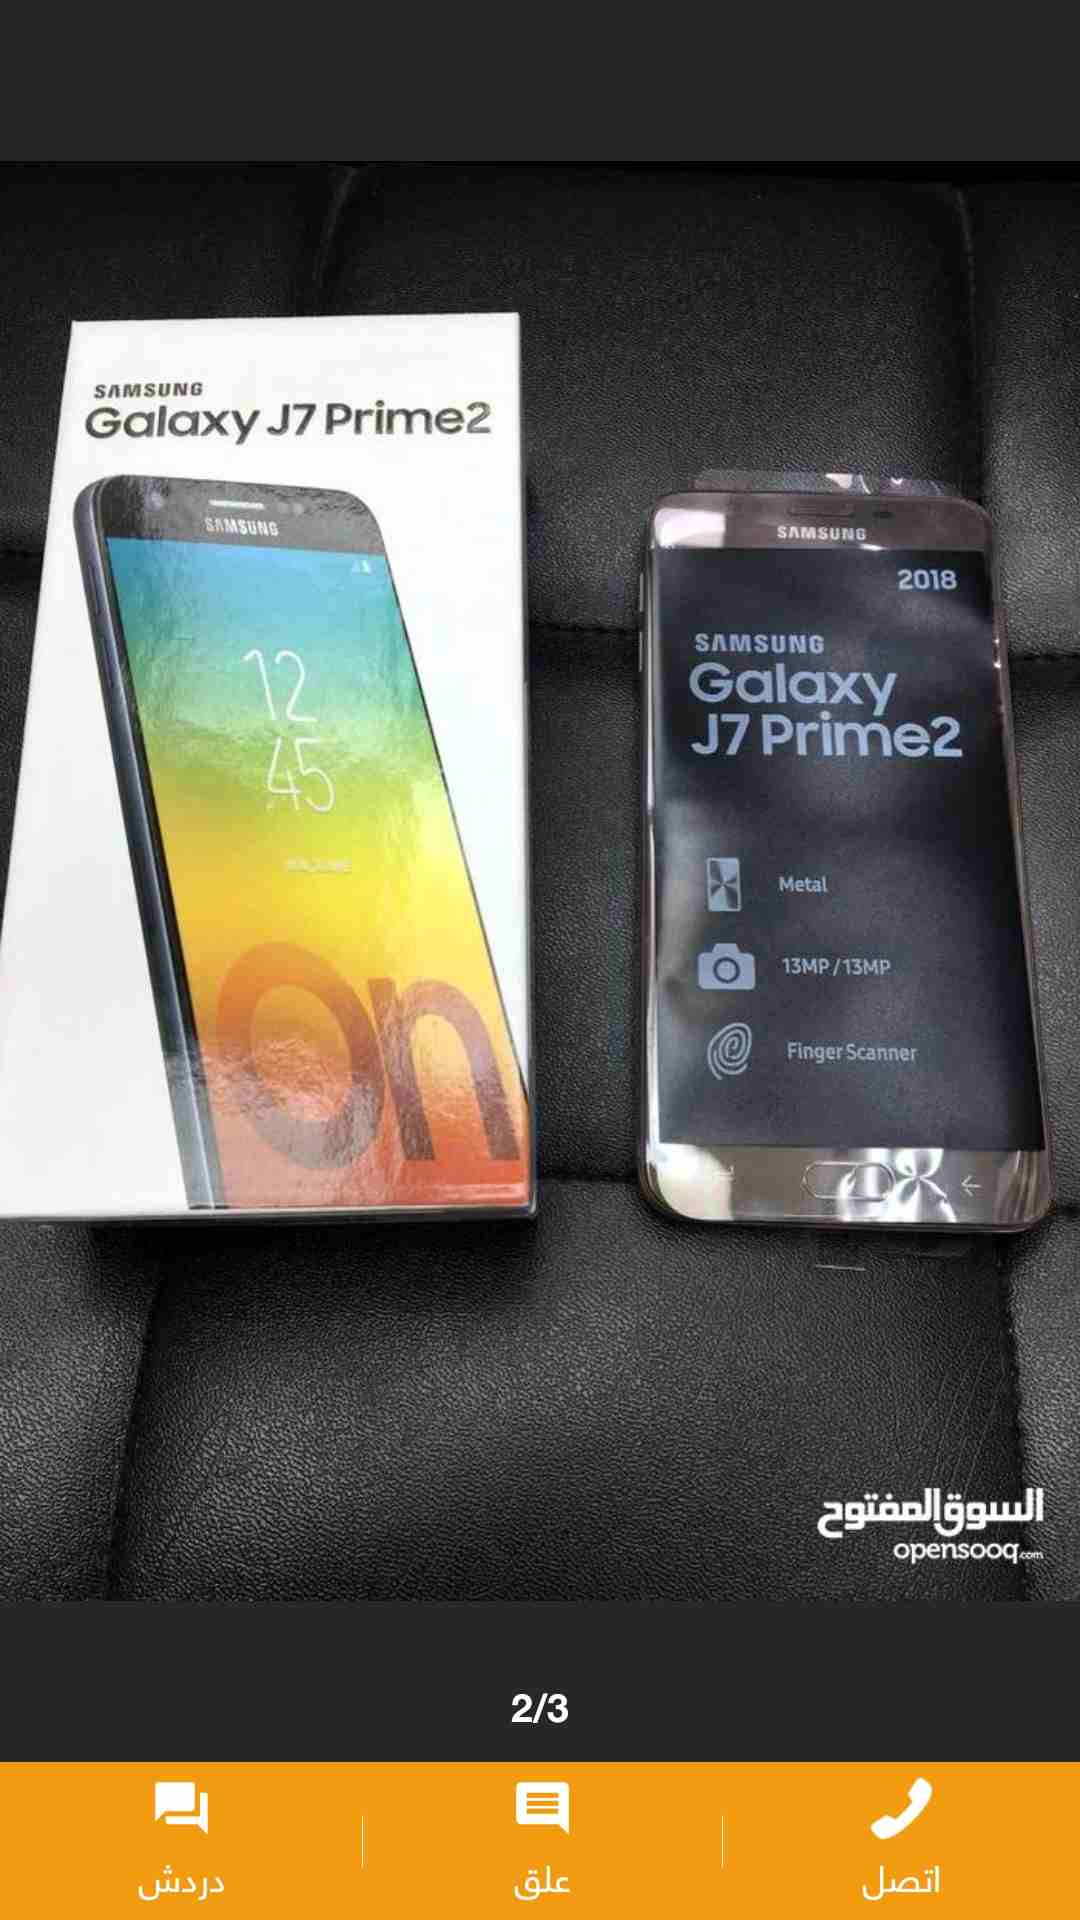 samasung galaxy s8 64GB with box all the accessories-  Samsung Galaxy...